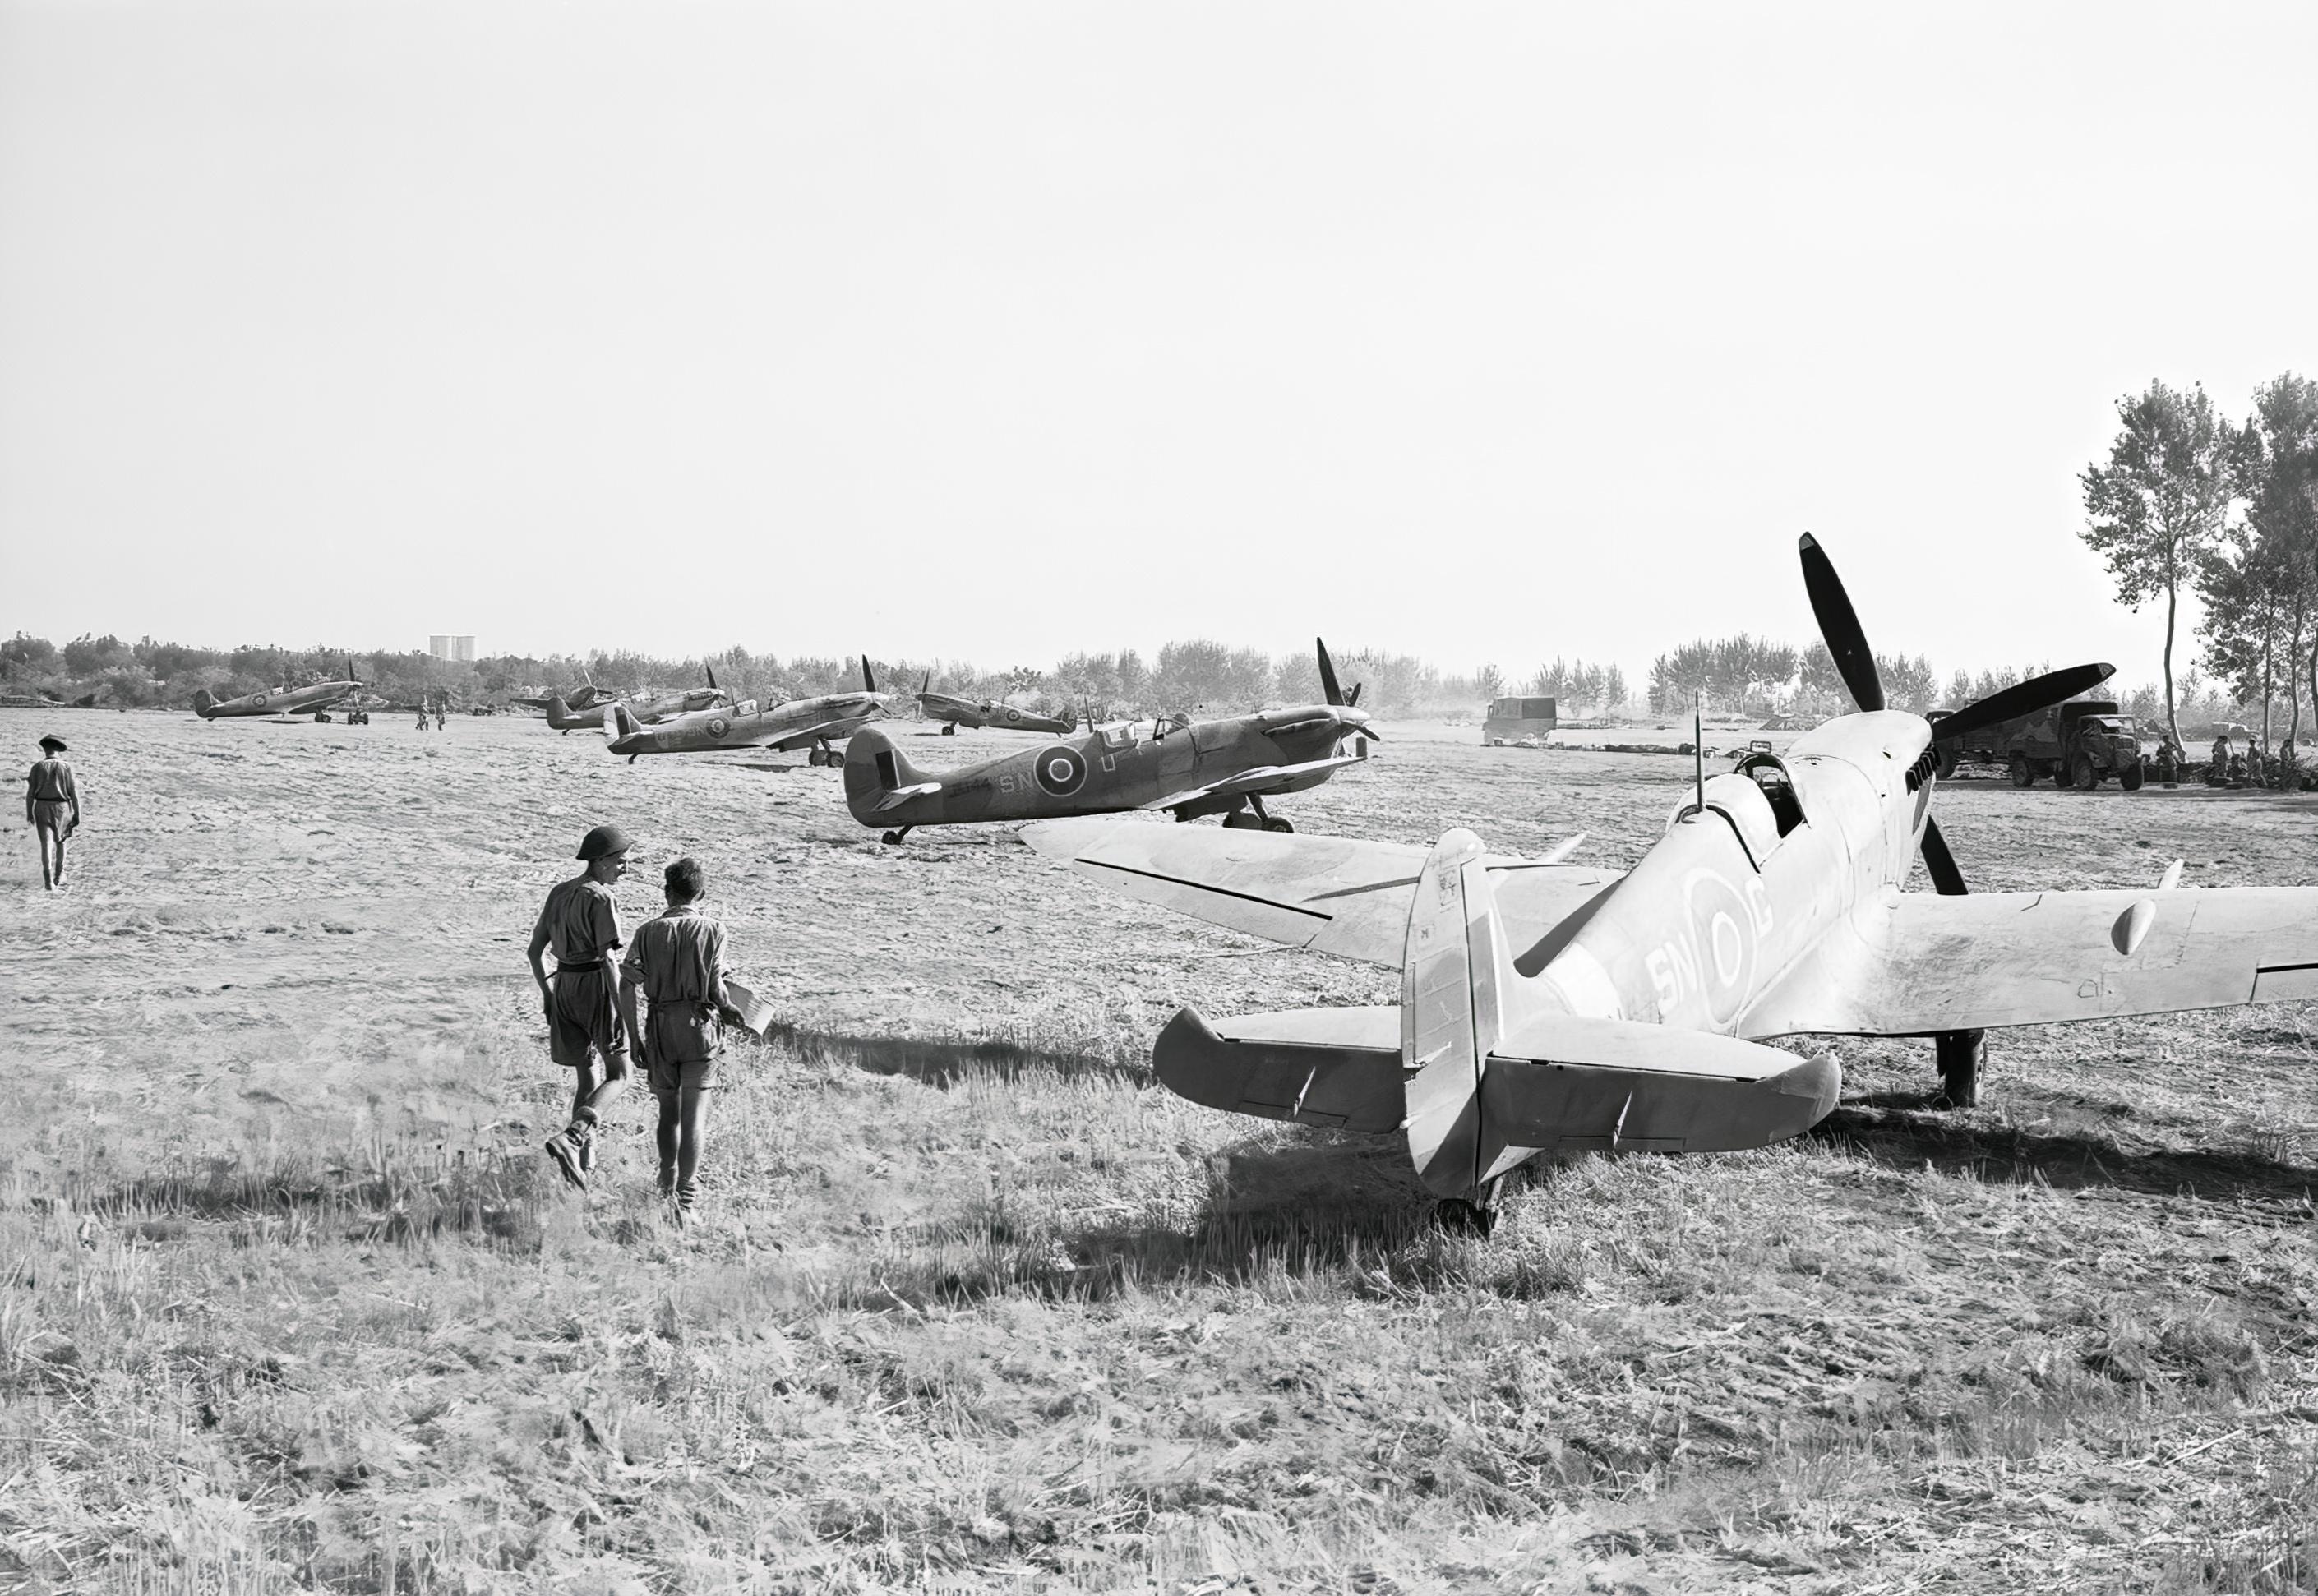 Spitfire Vc RAF 243Sqn SNG SNU JK144 at Tusciano landing ground Salerno IWM CNA1425